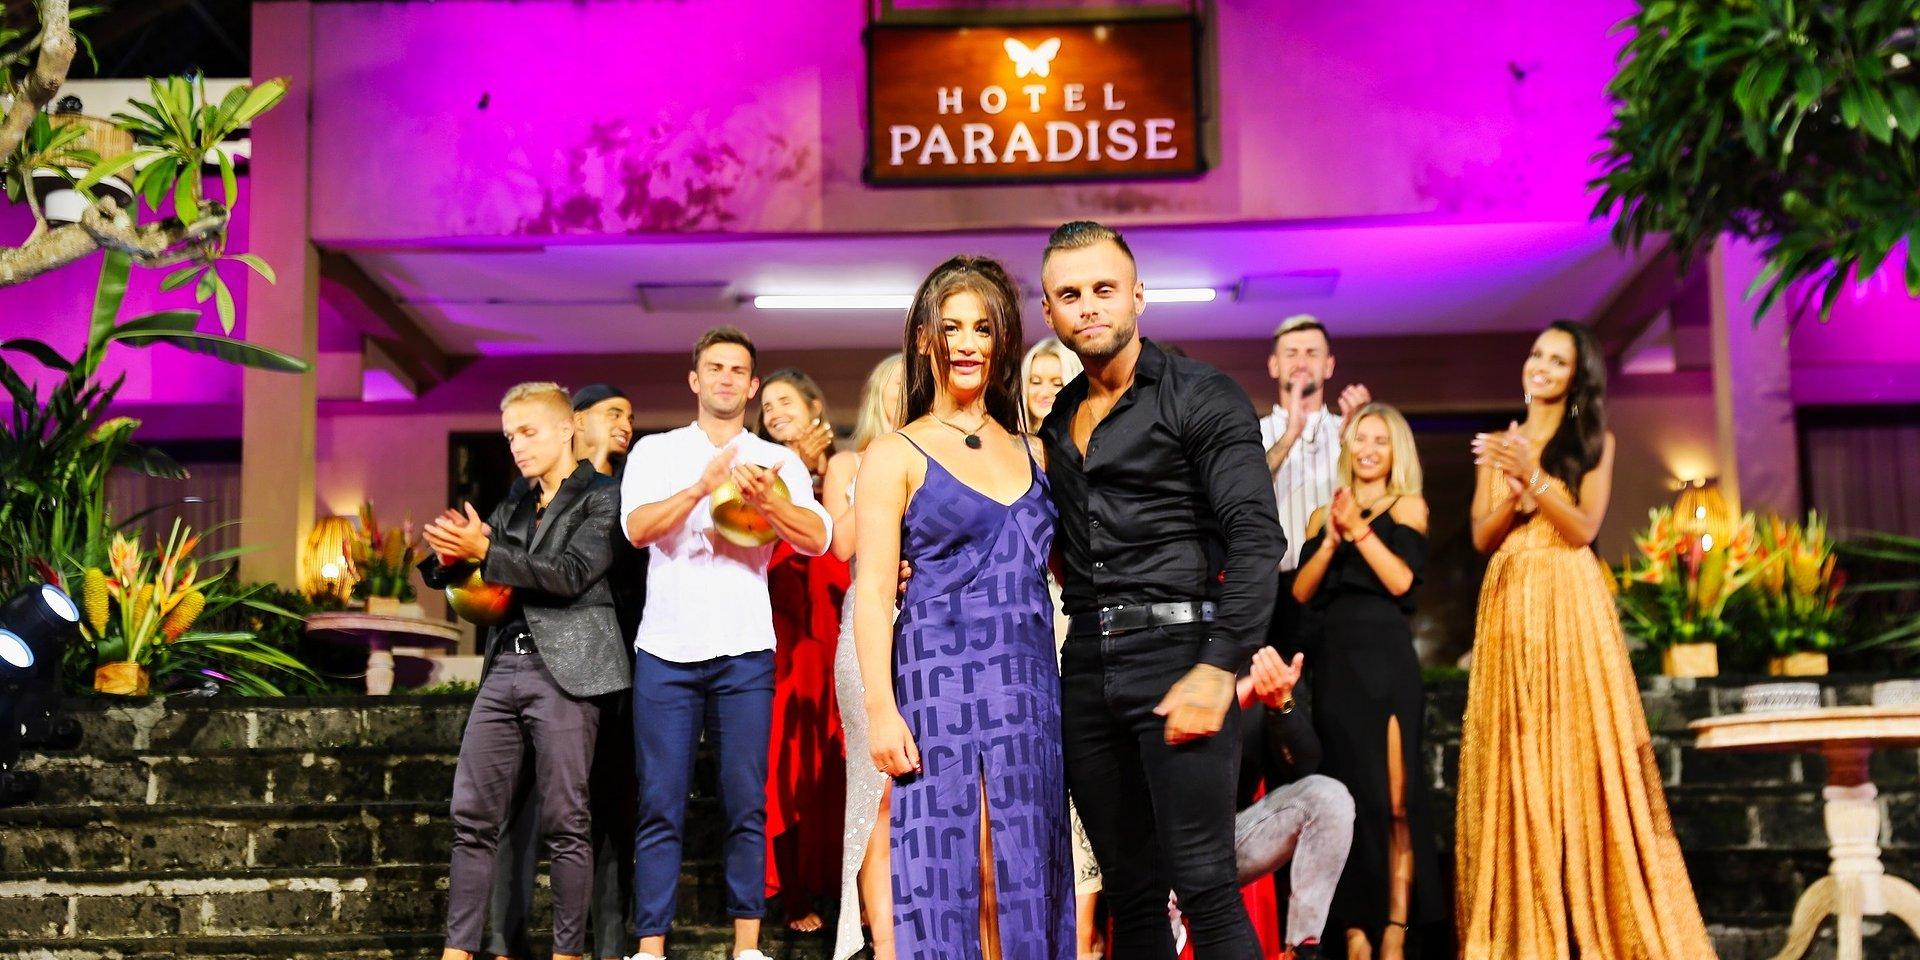 """Hotel Paradise"" hitem oglądalności w Siódemce!"